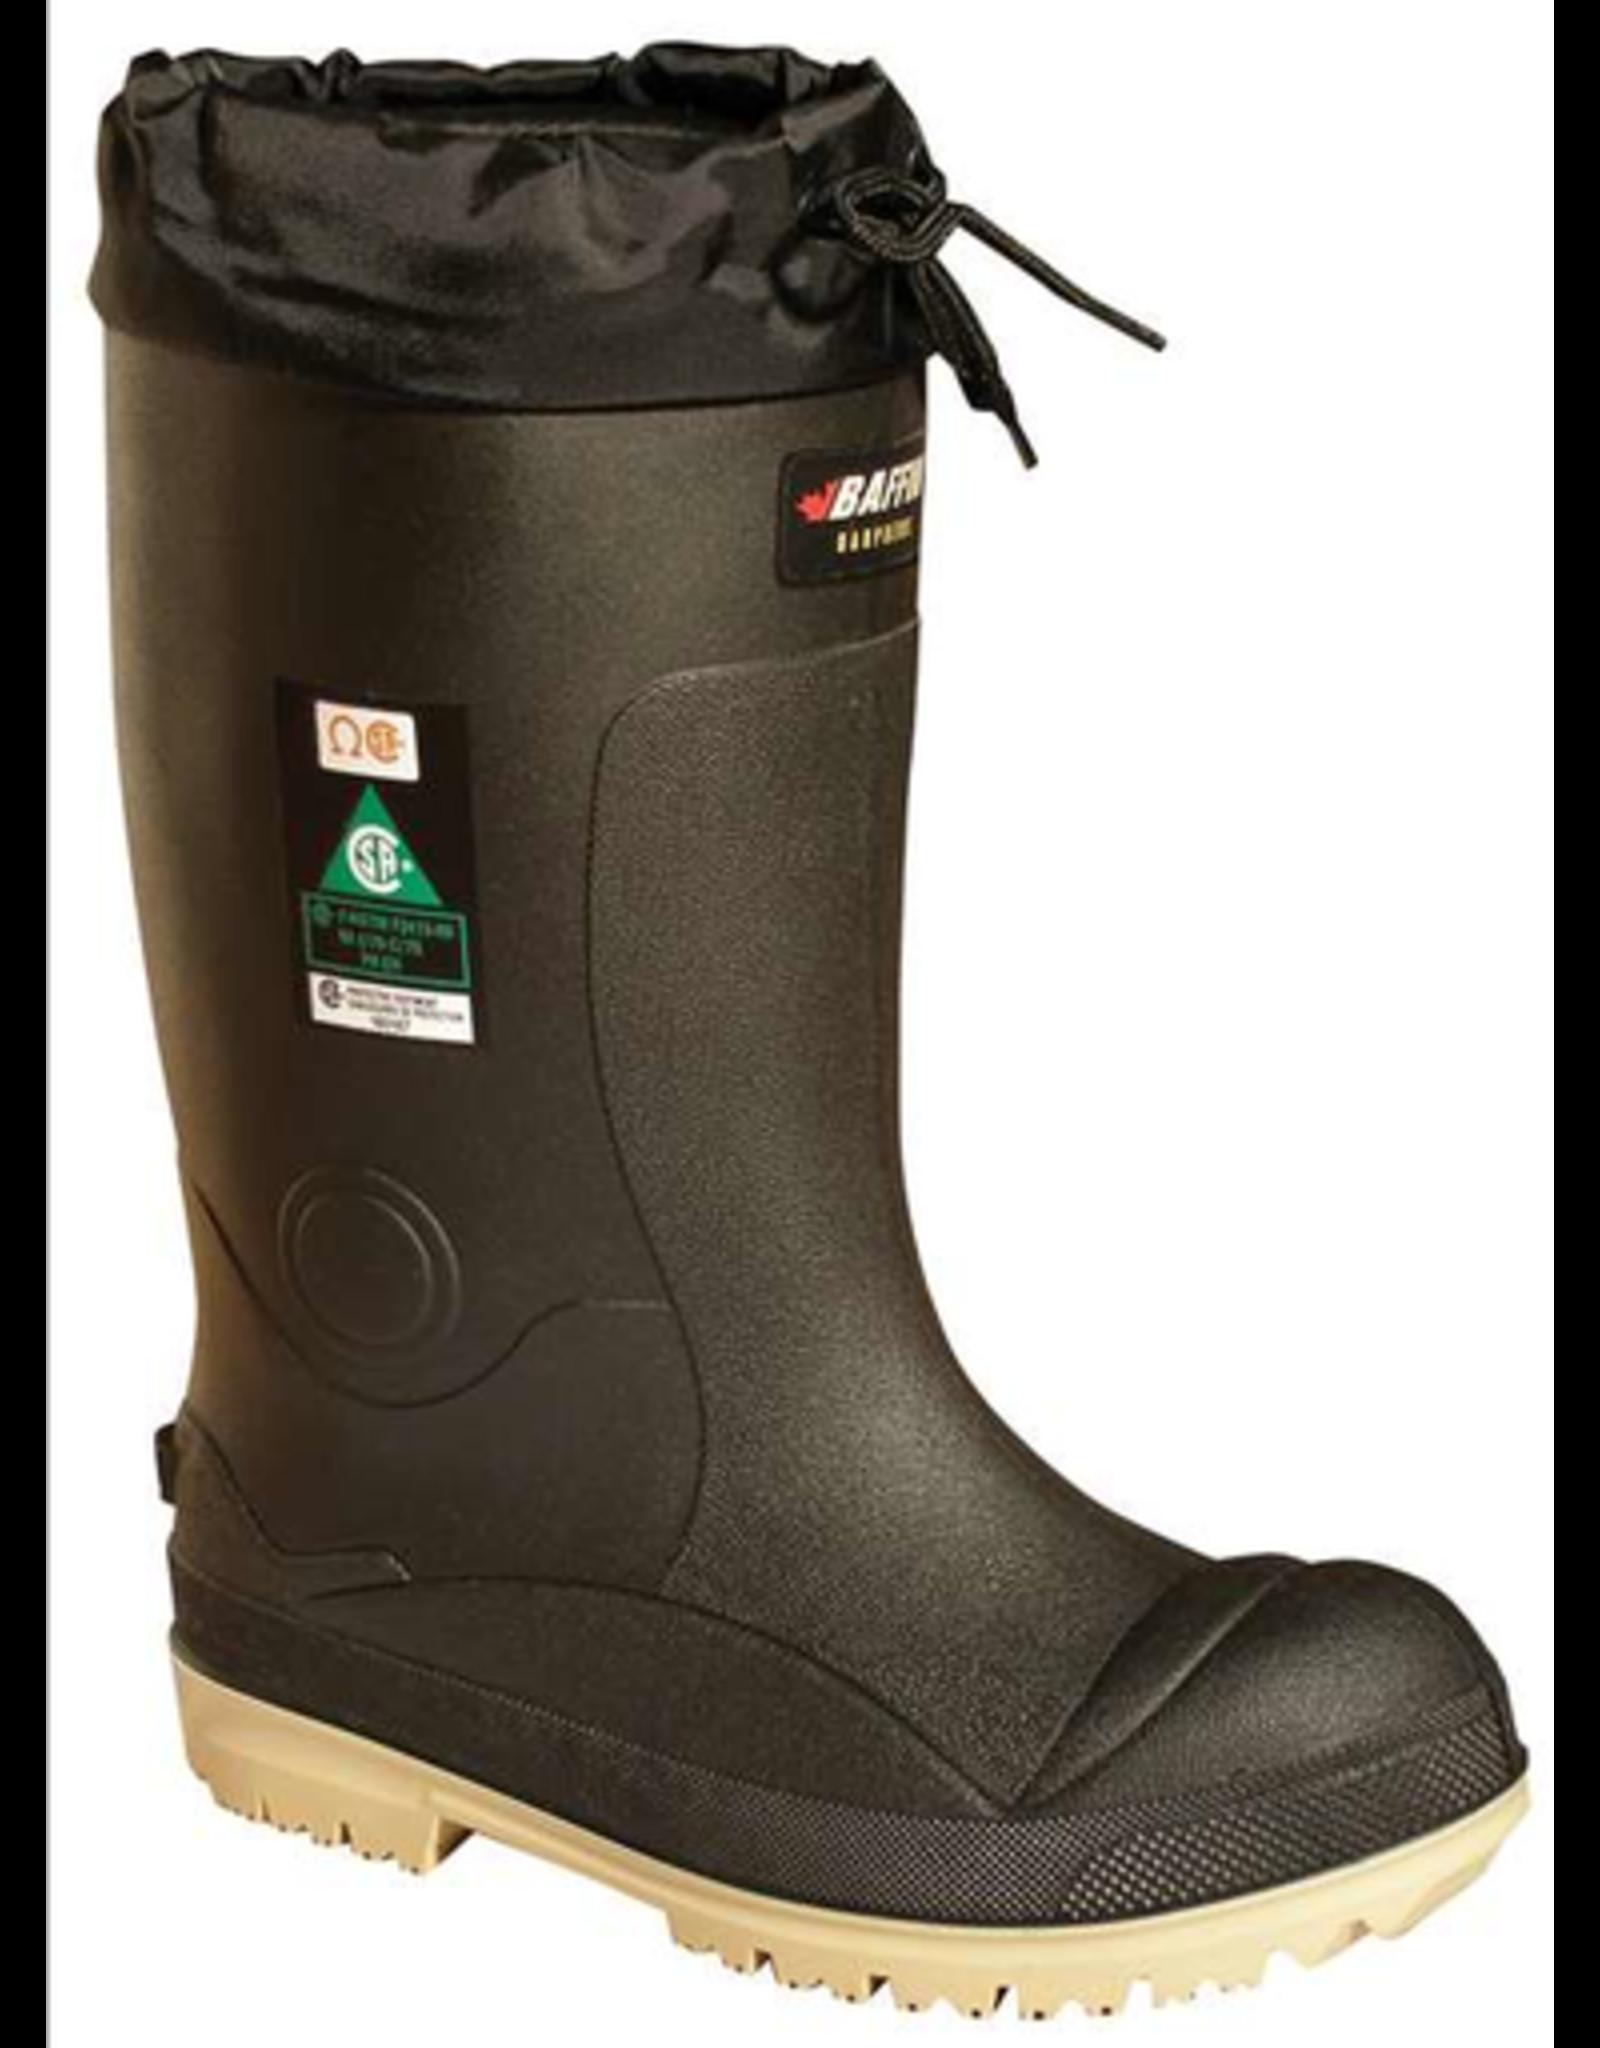 Baffin Baffin Mens Titan, -100, Steel Toe and Plate Boot With Oraprene